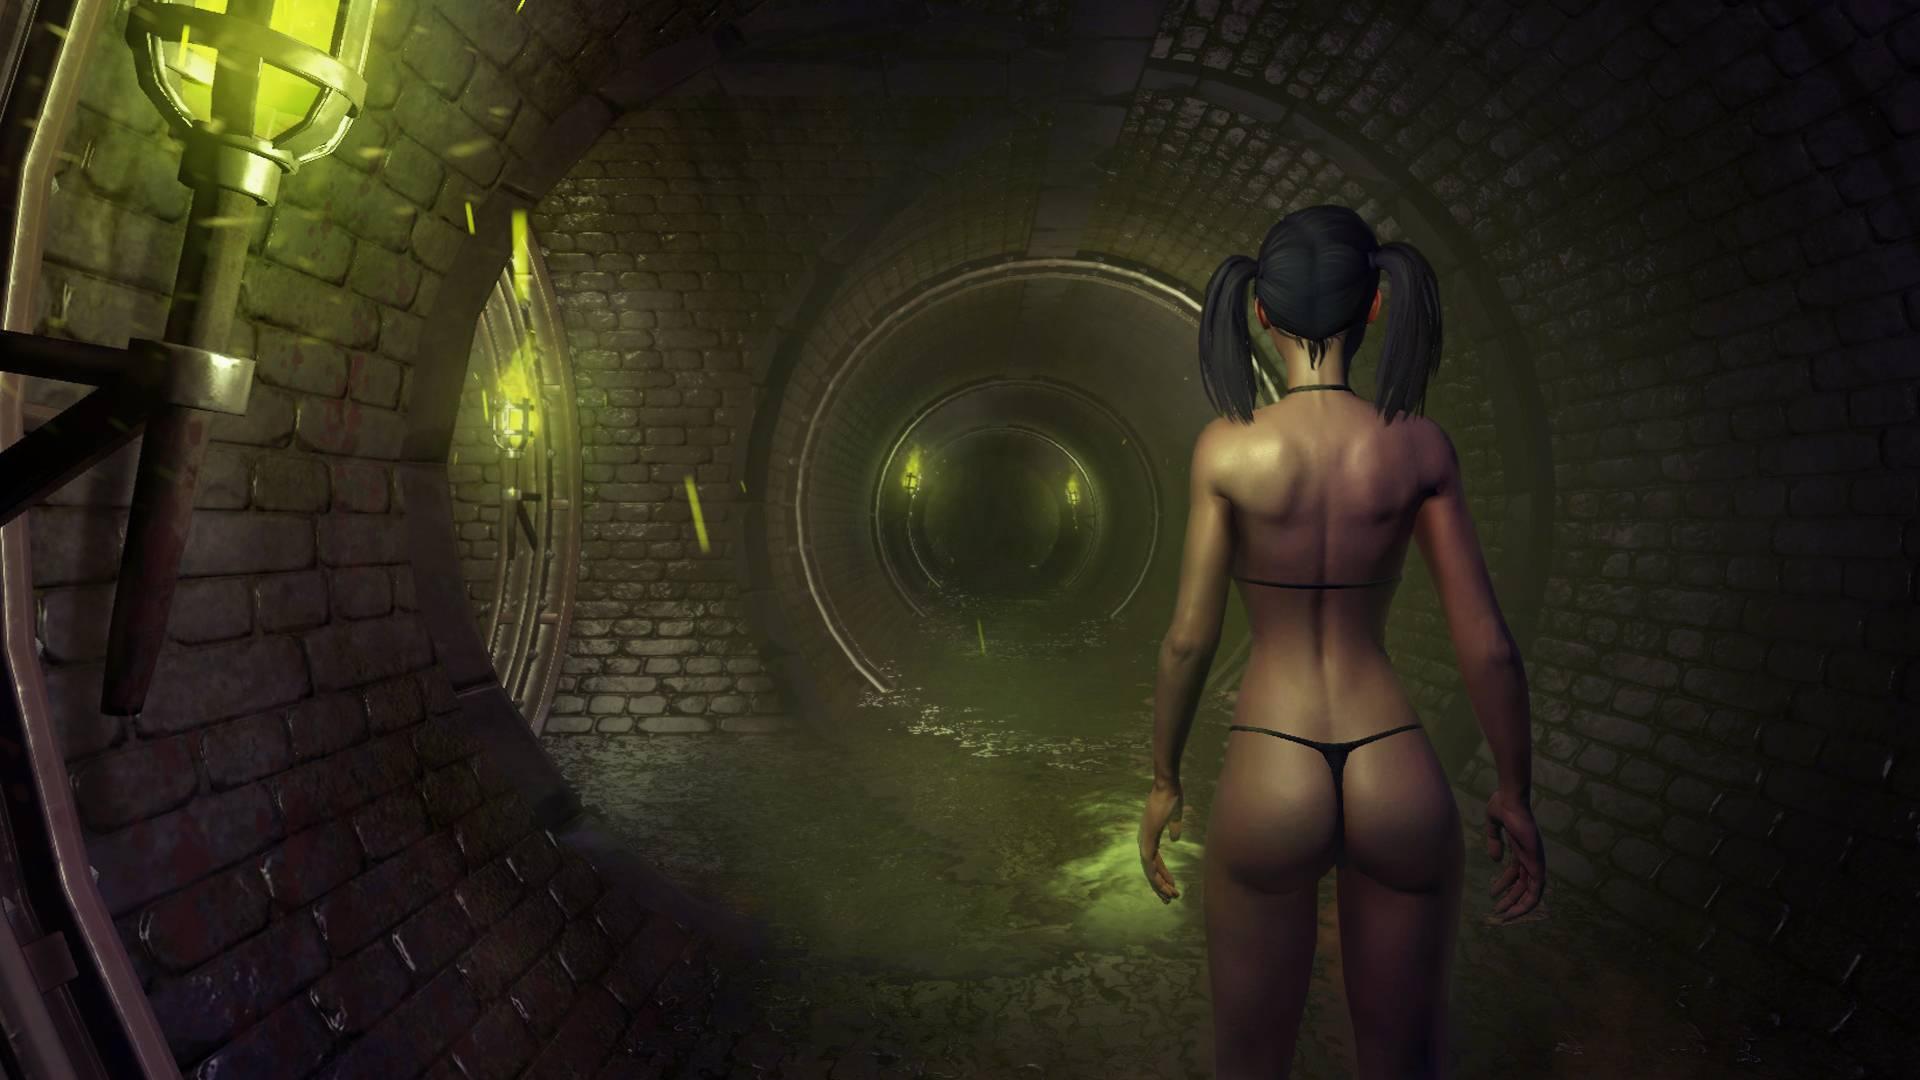 Free eroticas games